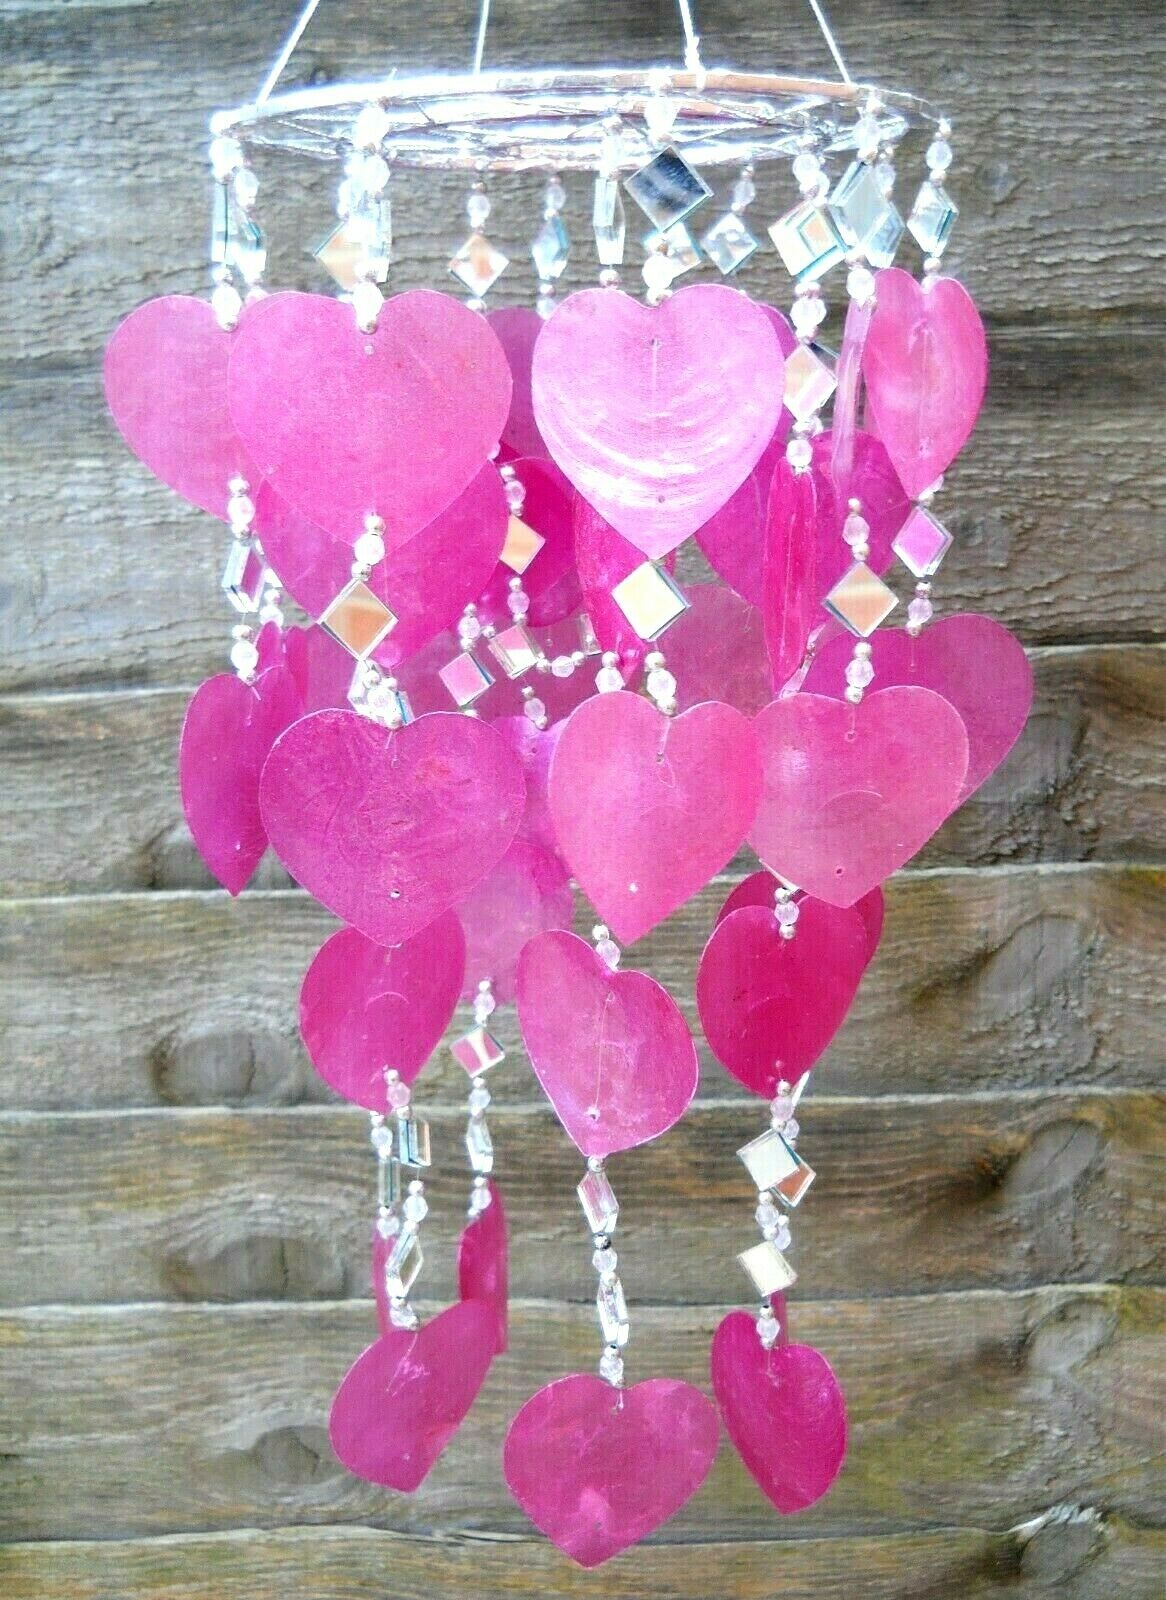 Capiz Shells & Mirrors Shape Jellyfish Windchime Mobile SOFT PINK Colour 65cm